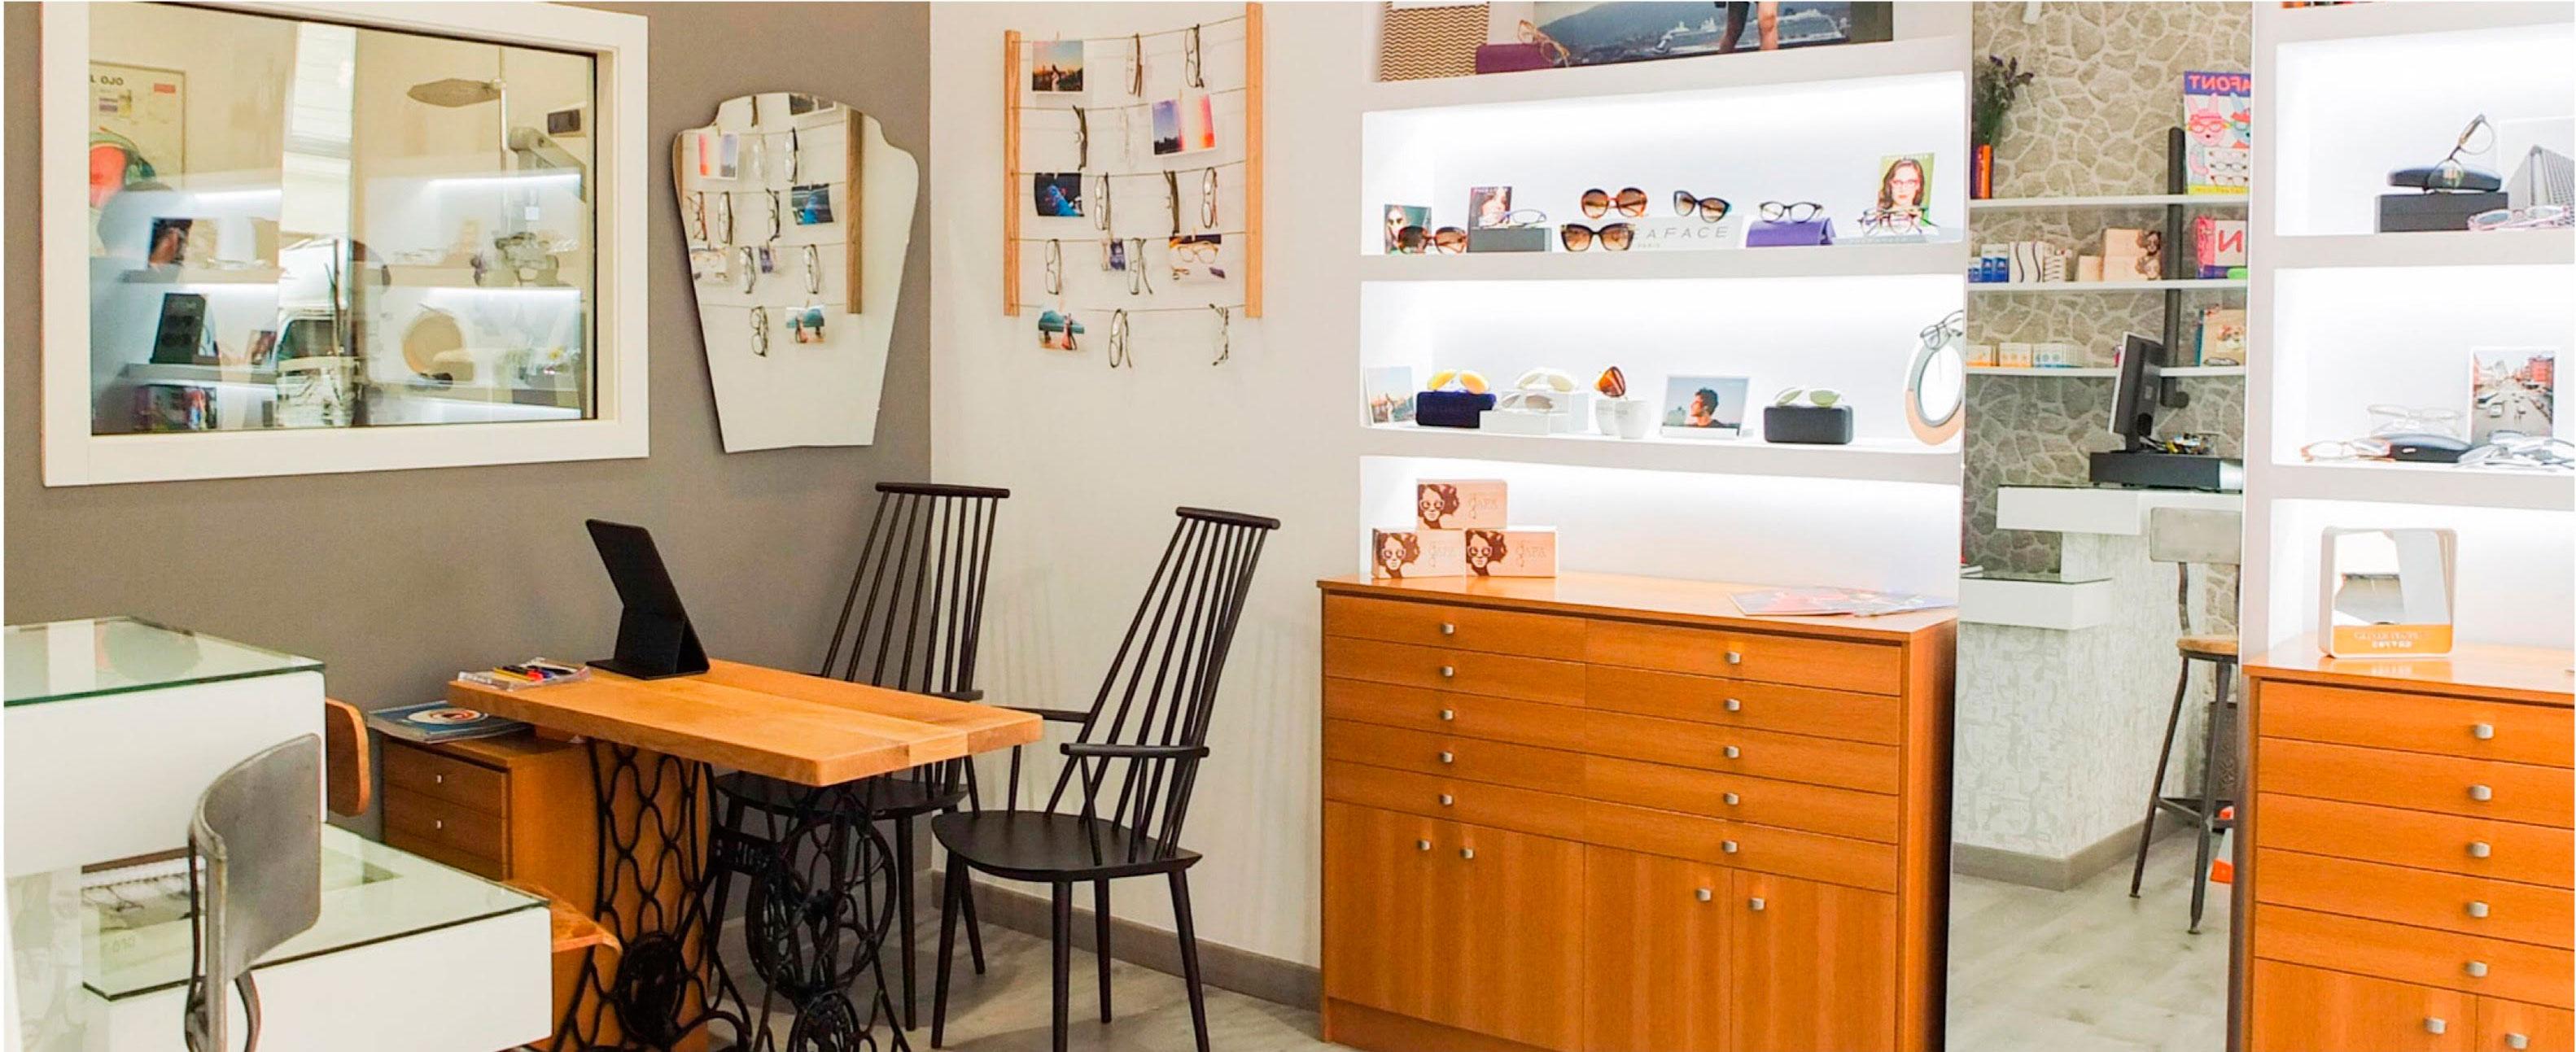 La  Gafa Boutique - Eyewear Bilbao